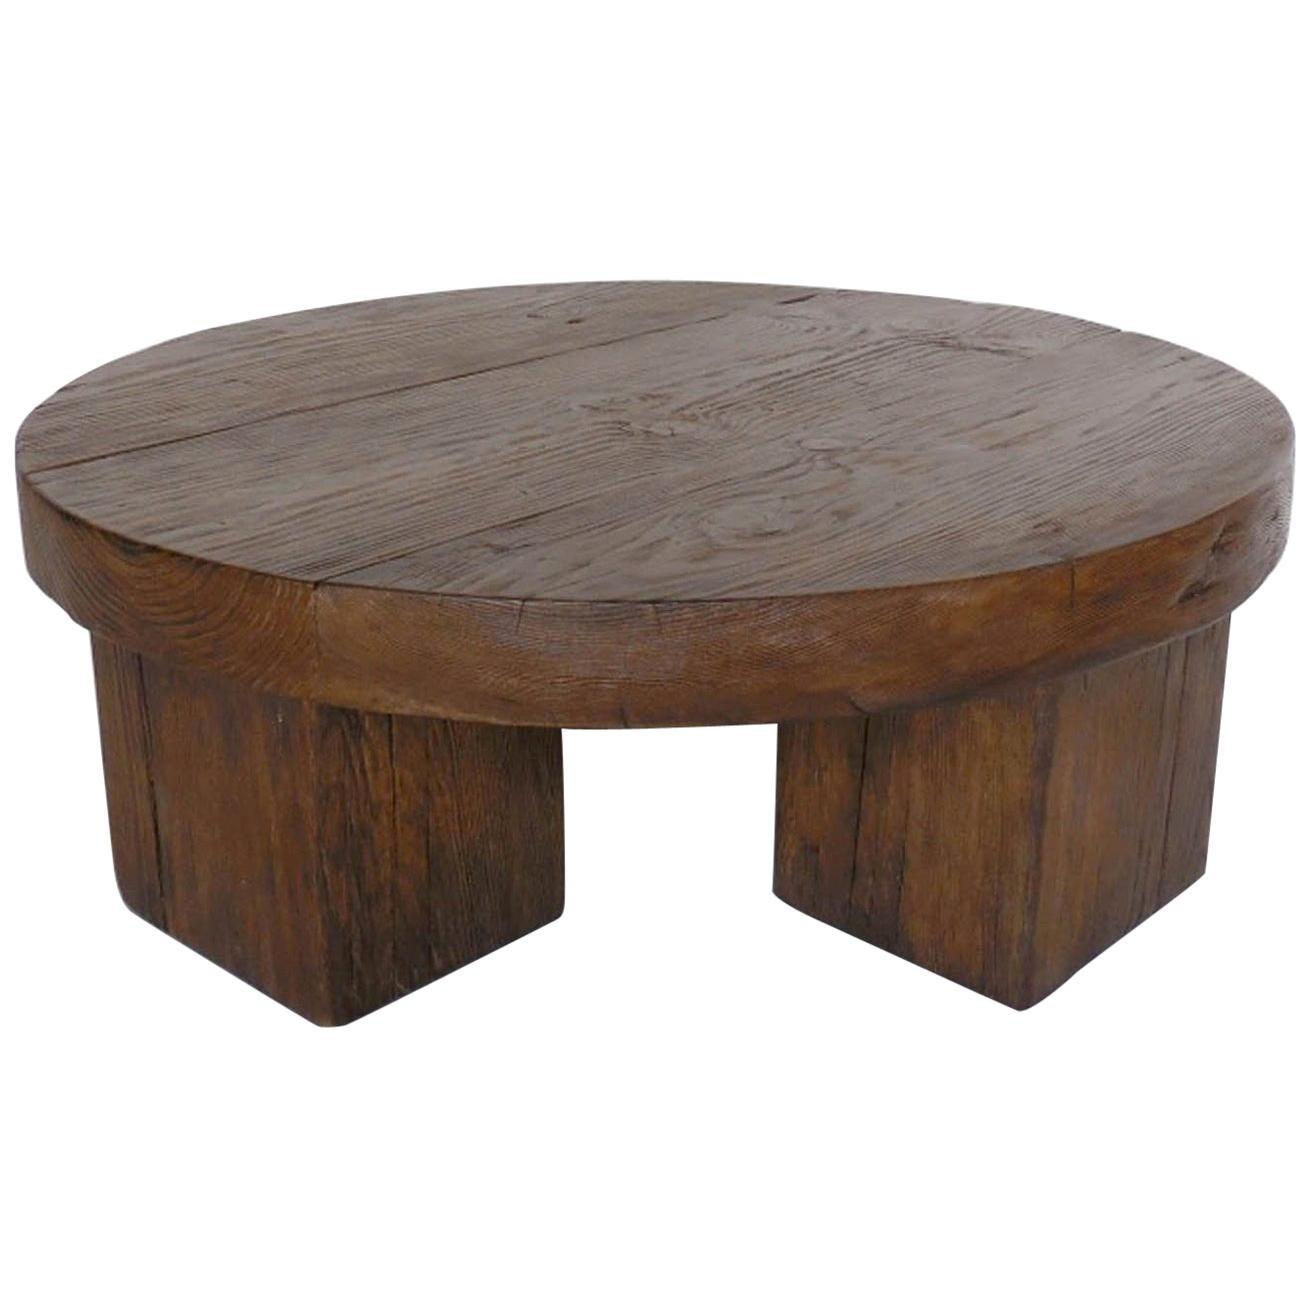 Custom Reclaimed Wood Rustic Chunky Round Coffee Table At 1stdibs